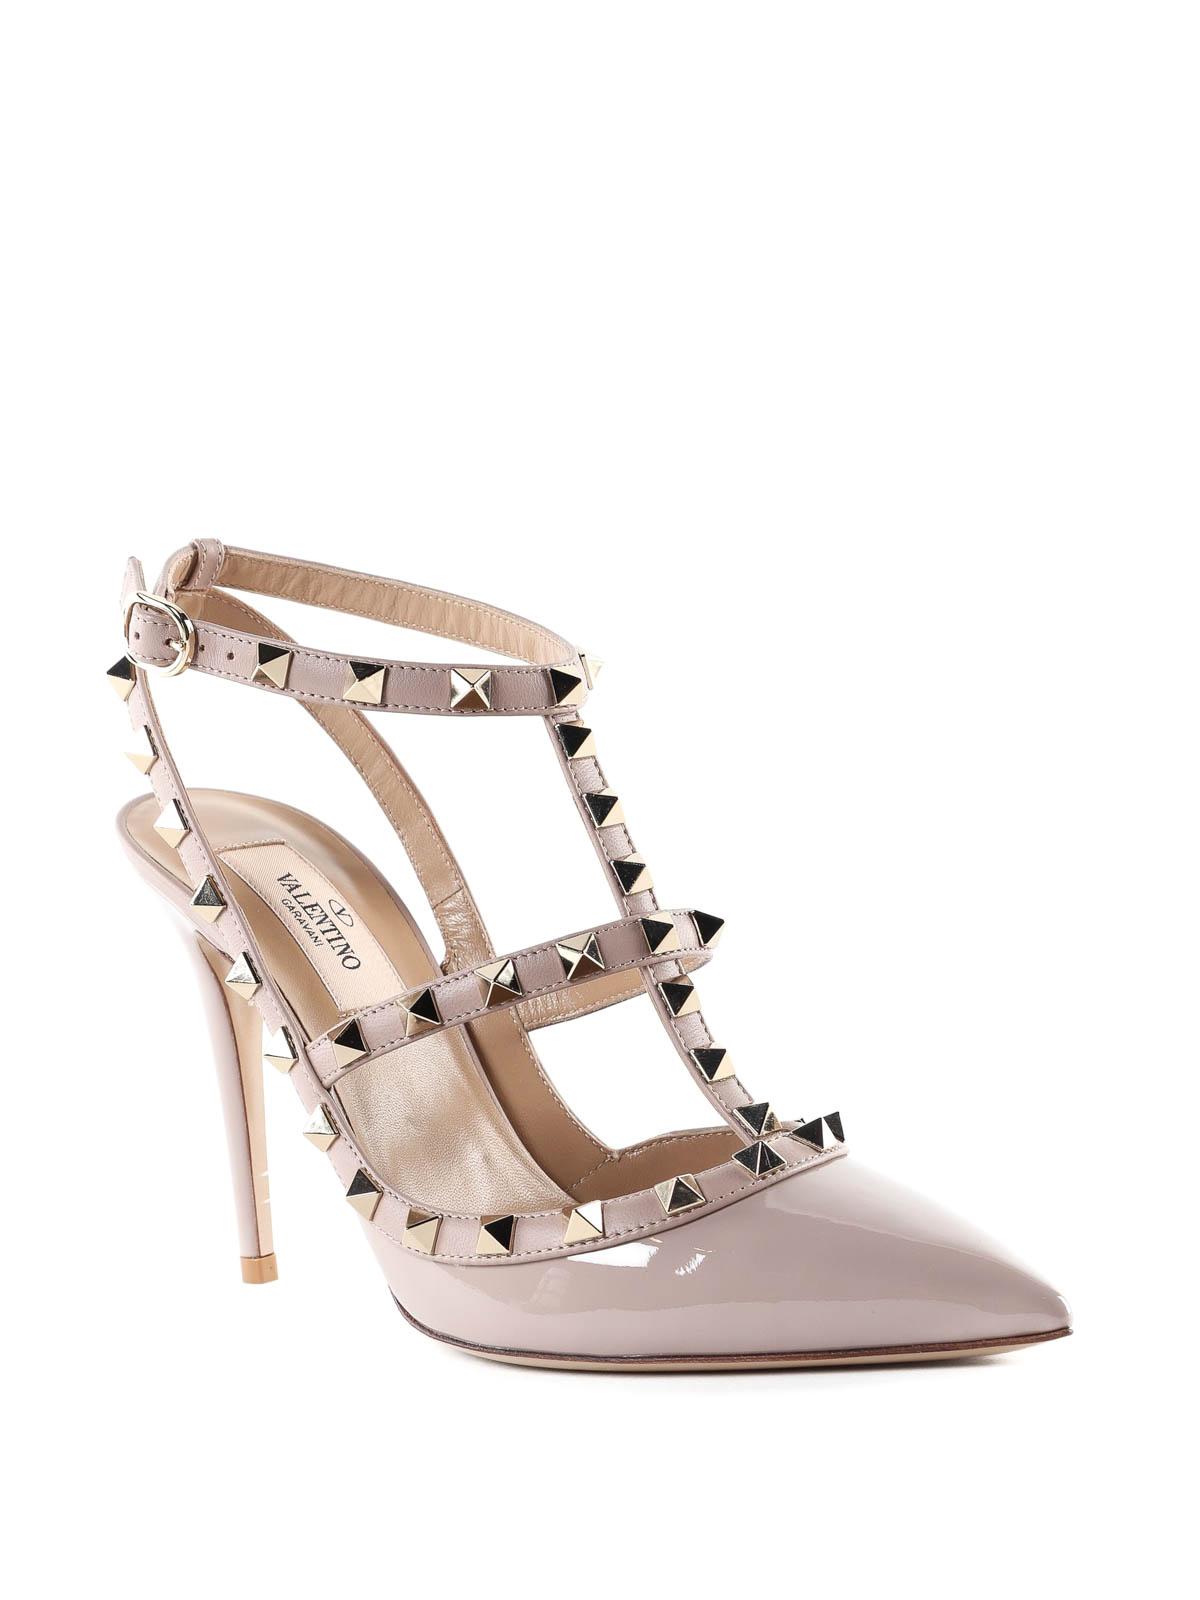 77330f35bf3 VALENTINO GARAVANI  court shoes online - Rockstud patent leather slingbacks